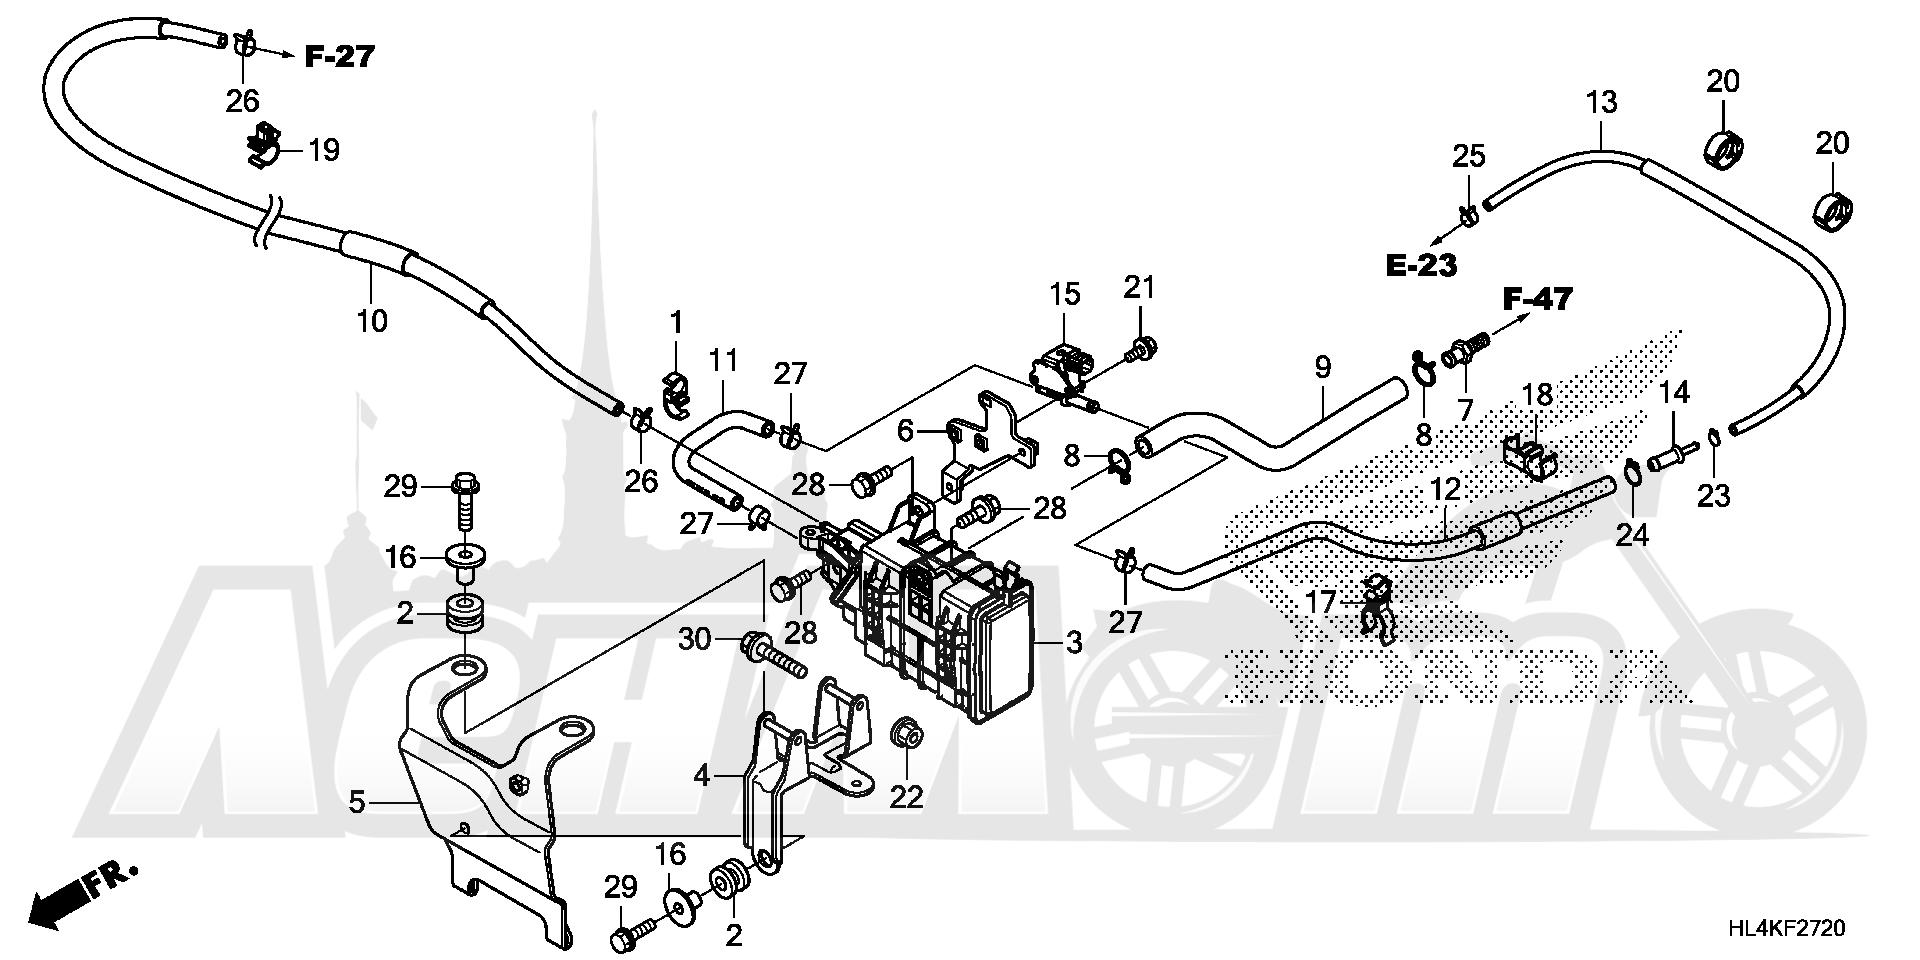 Запчасти для Квадроцикла Honda 2019 SXS1000M5L Раздел: EVAP CANISTER | EVAP канистра